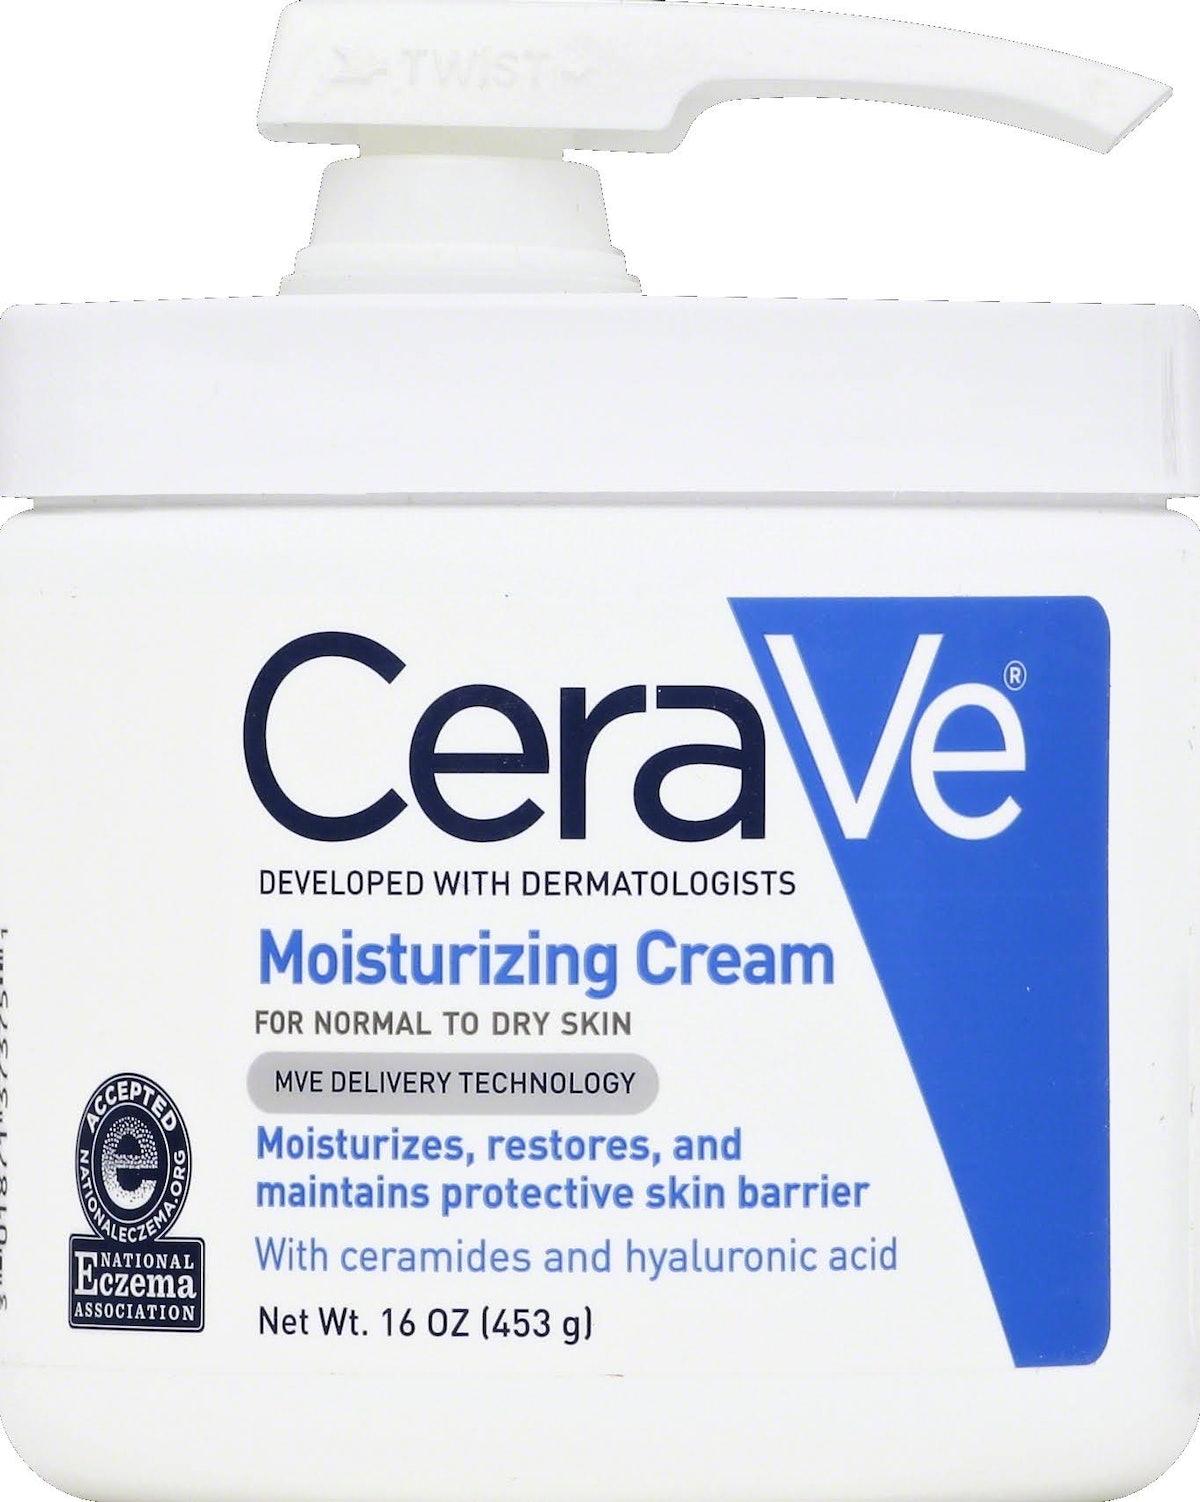 CeraVe Moisturizing Cream with Pump, Body Cream for Dry Skin, 16 oz.